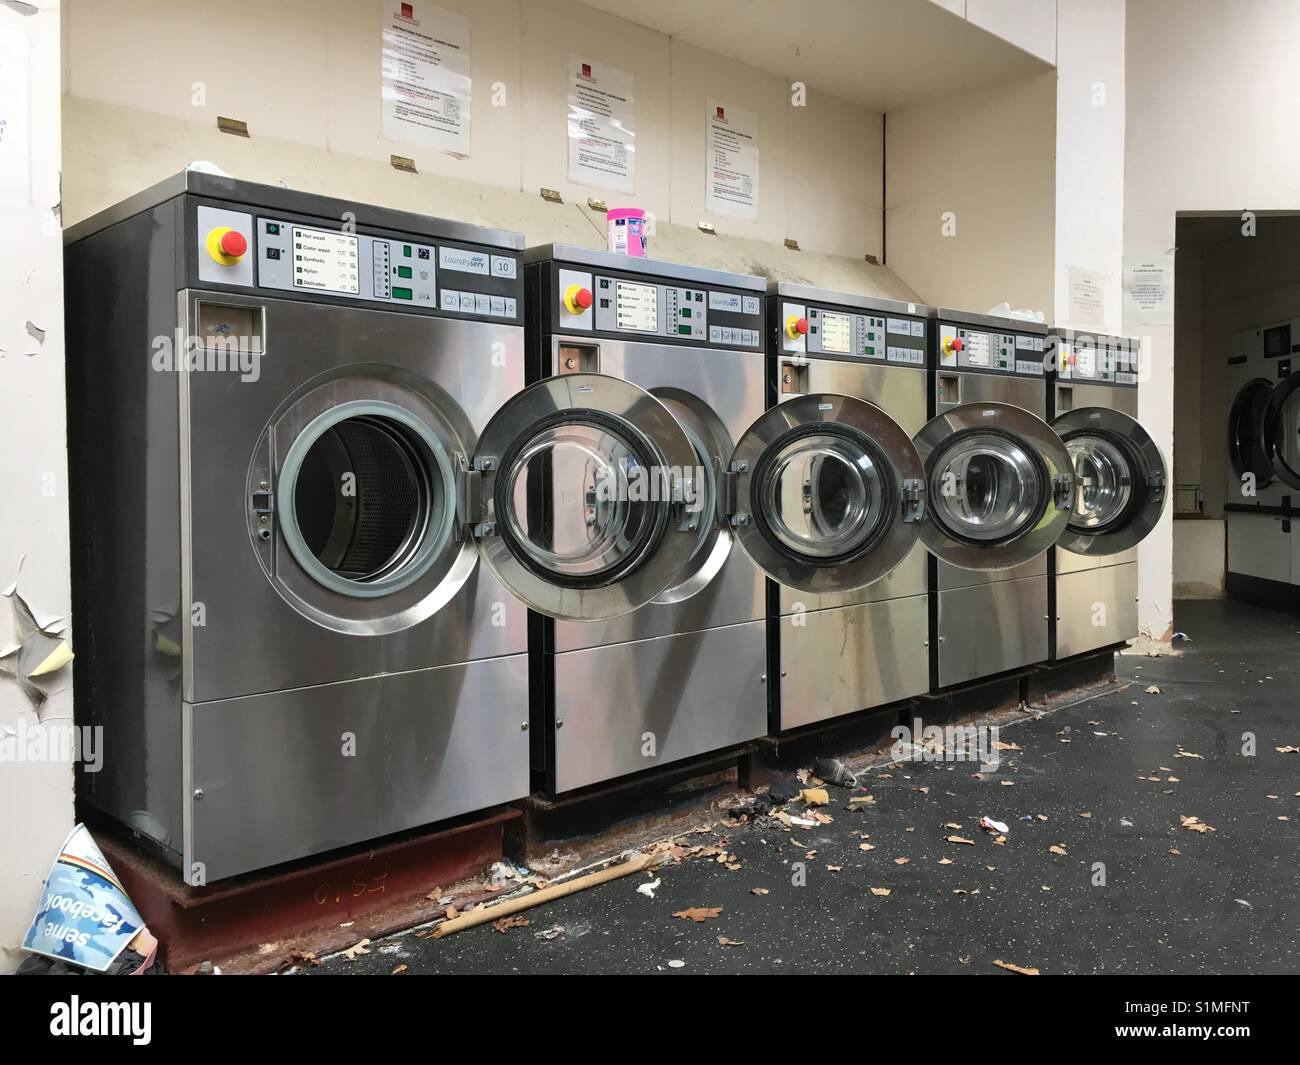 Empty commercial washing machines Stock Photo: 310852692 - Alamy